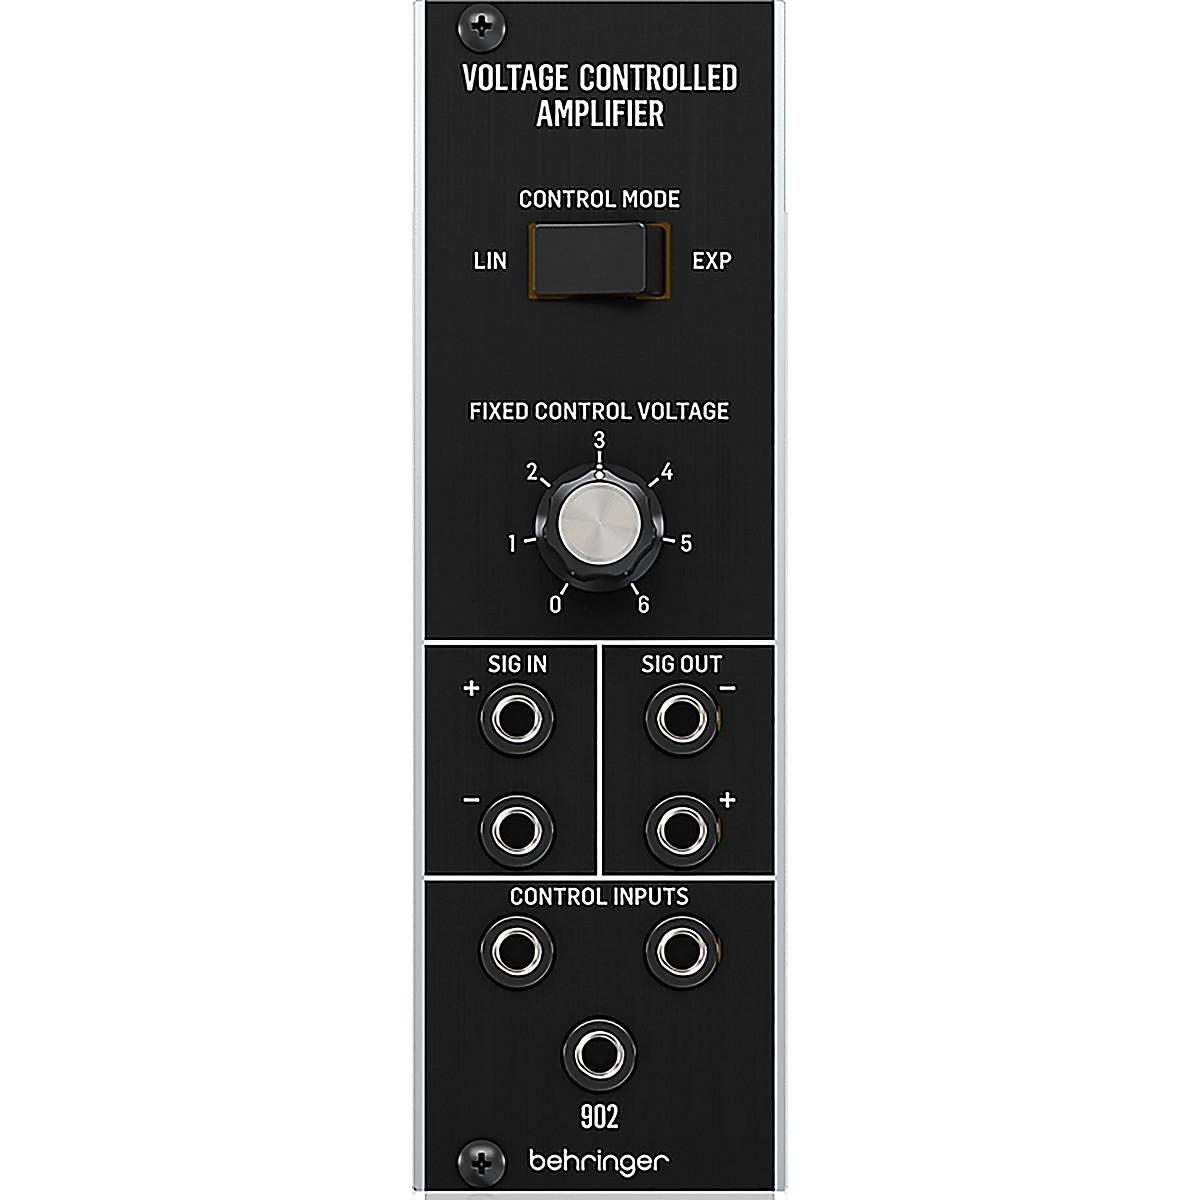 Behringer 902 Voltage Controlled Amplifier Eurorack Module